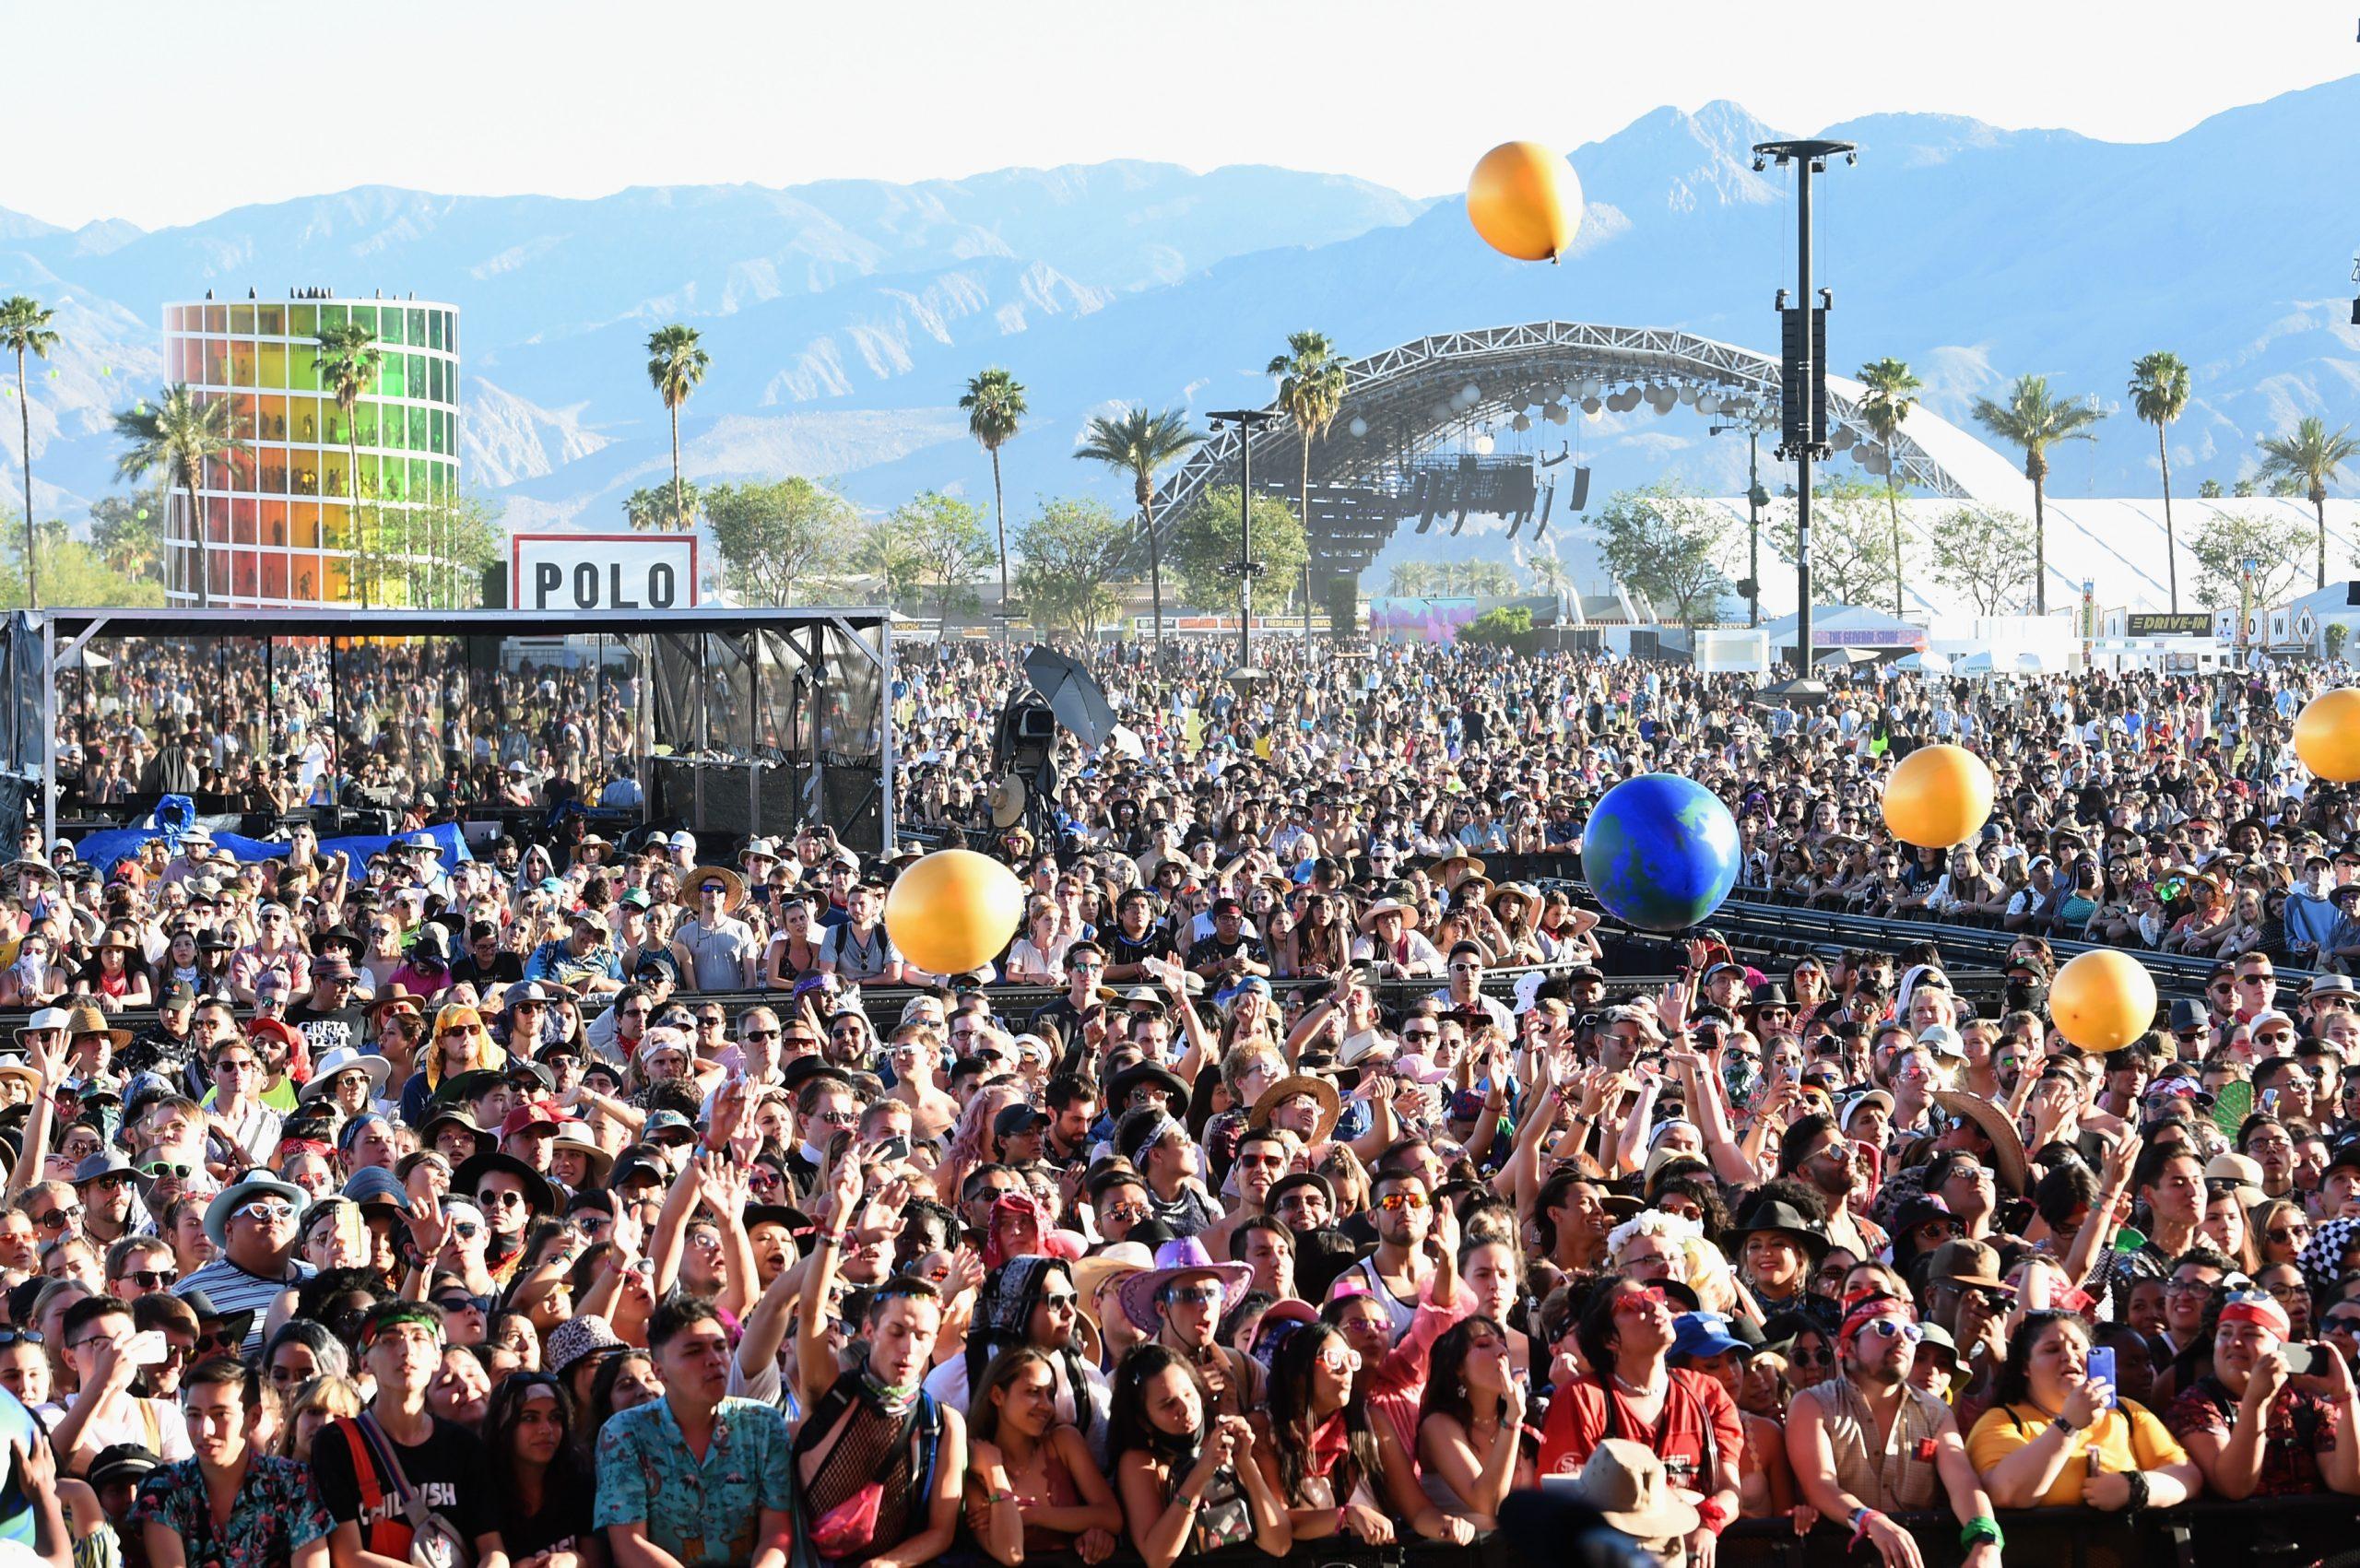 Time Magazine How Music Festivals Became Such a Big Busines